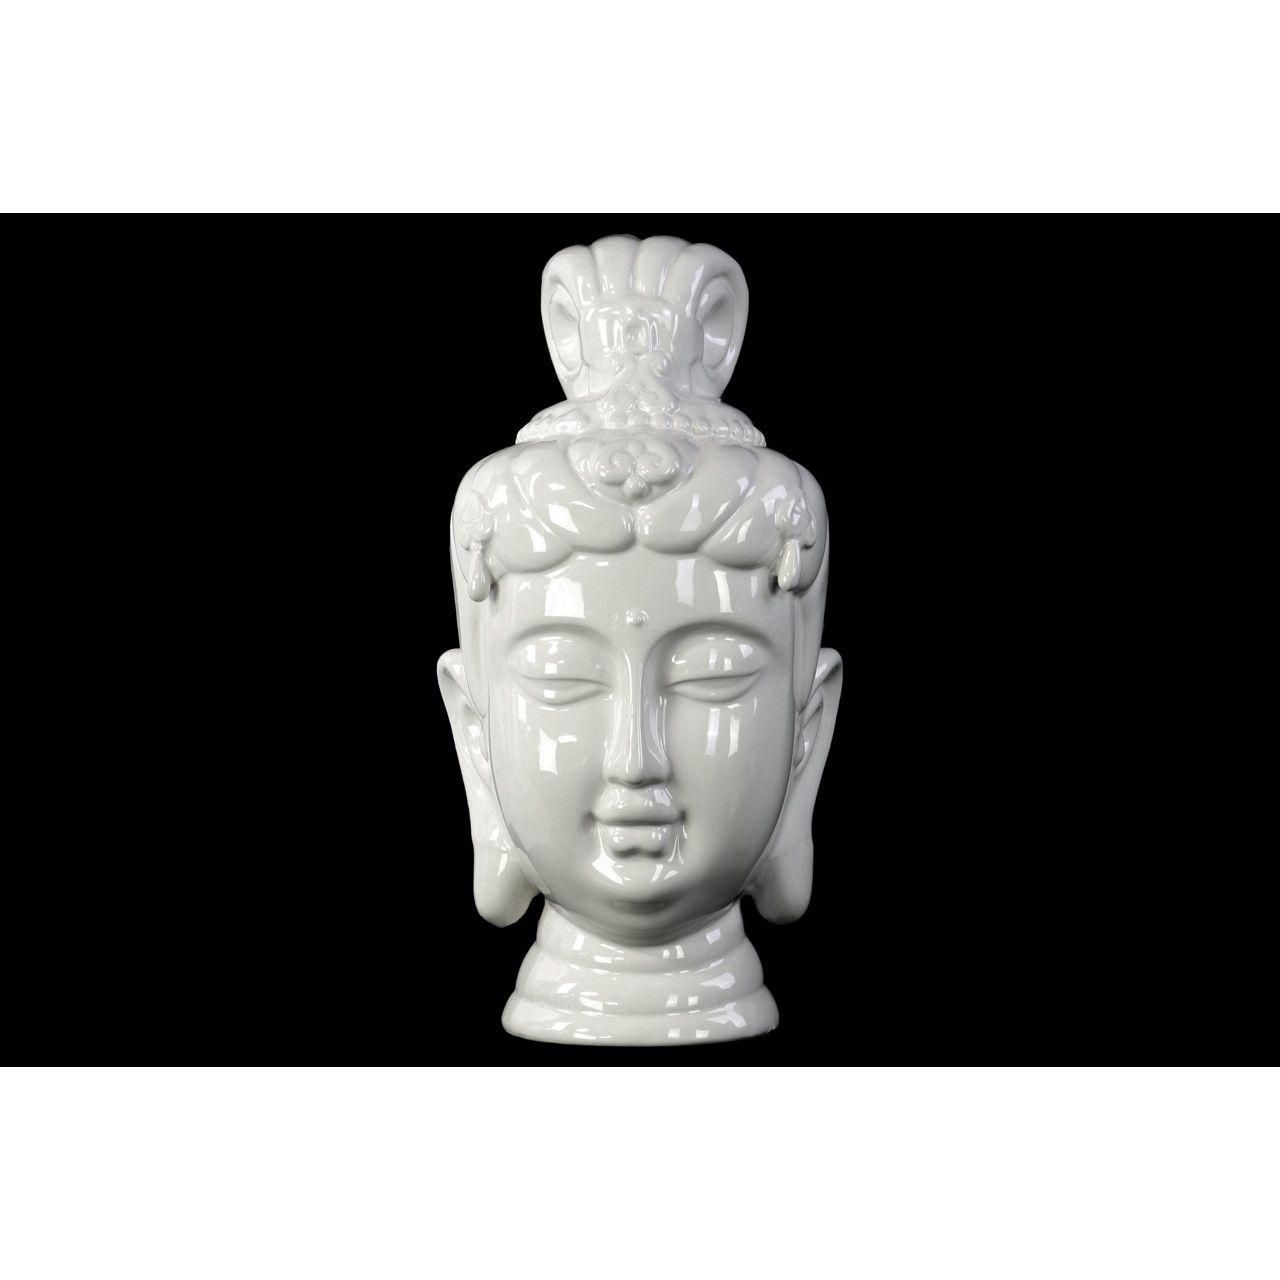 Buddha Head Decor Urban Trends Collection Ceramic Buddha Head Decor Gloss White